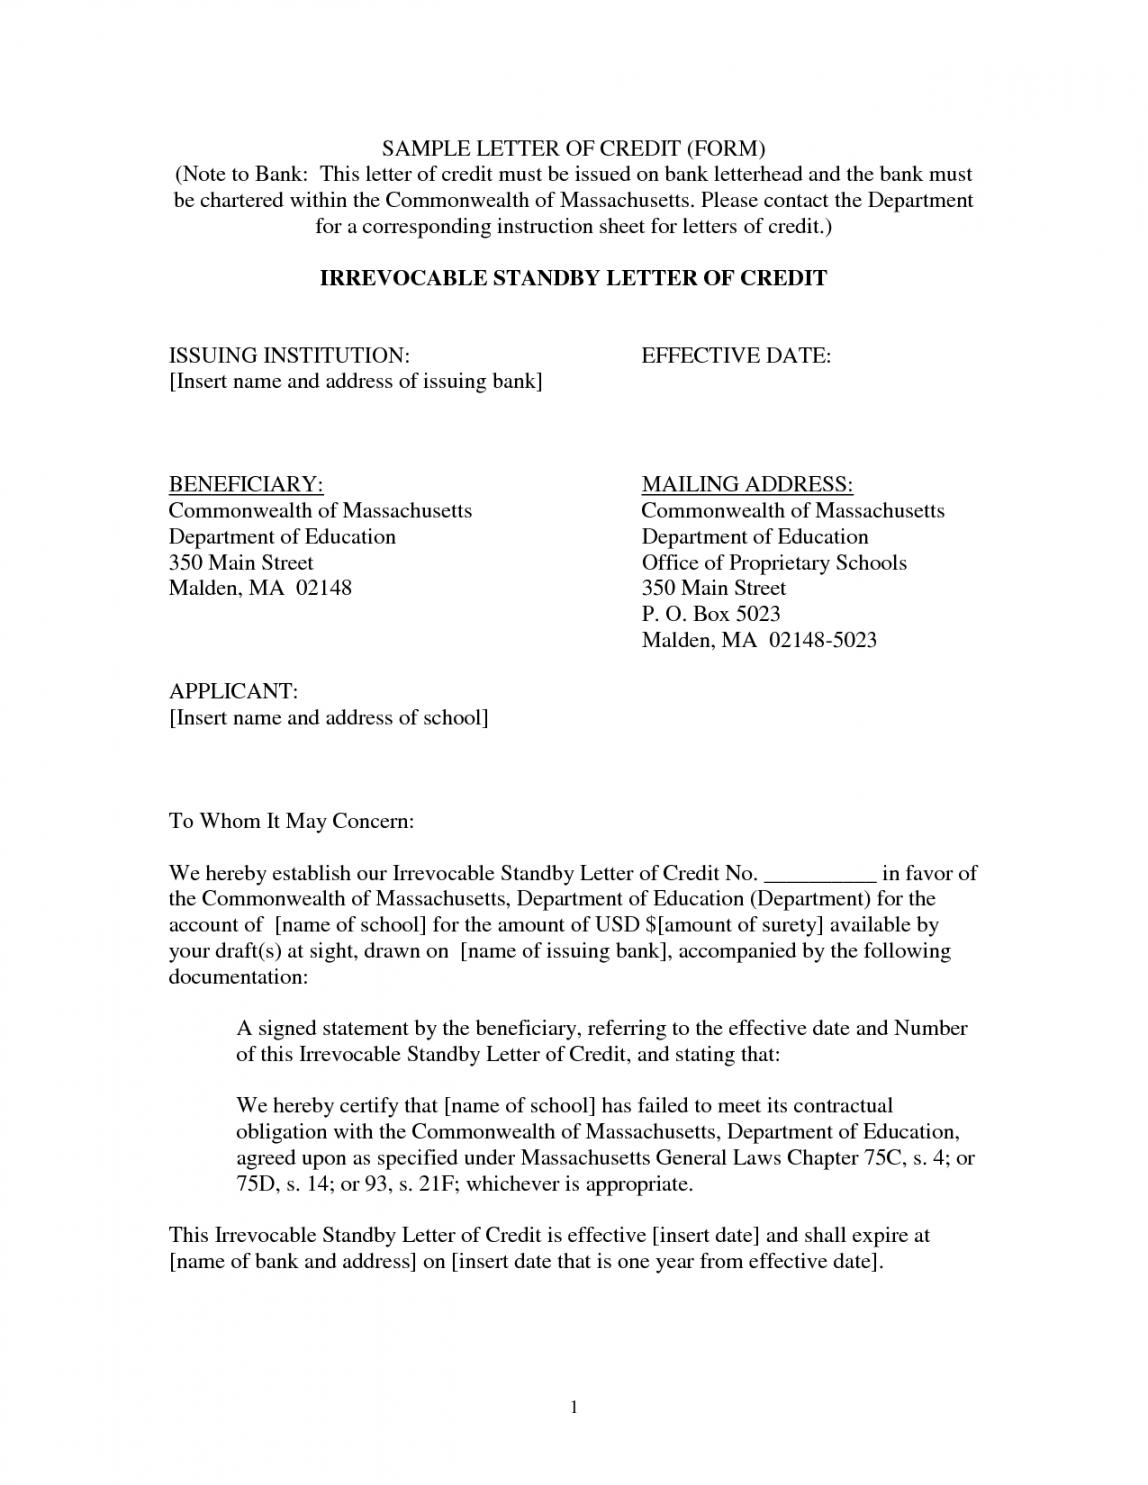 Advanced Credit Dispute Letter Template Intended For Credit Dispute Letter Template